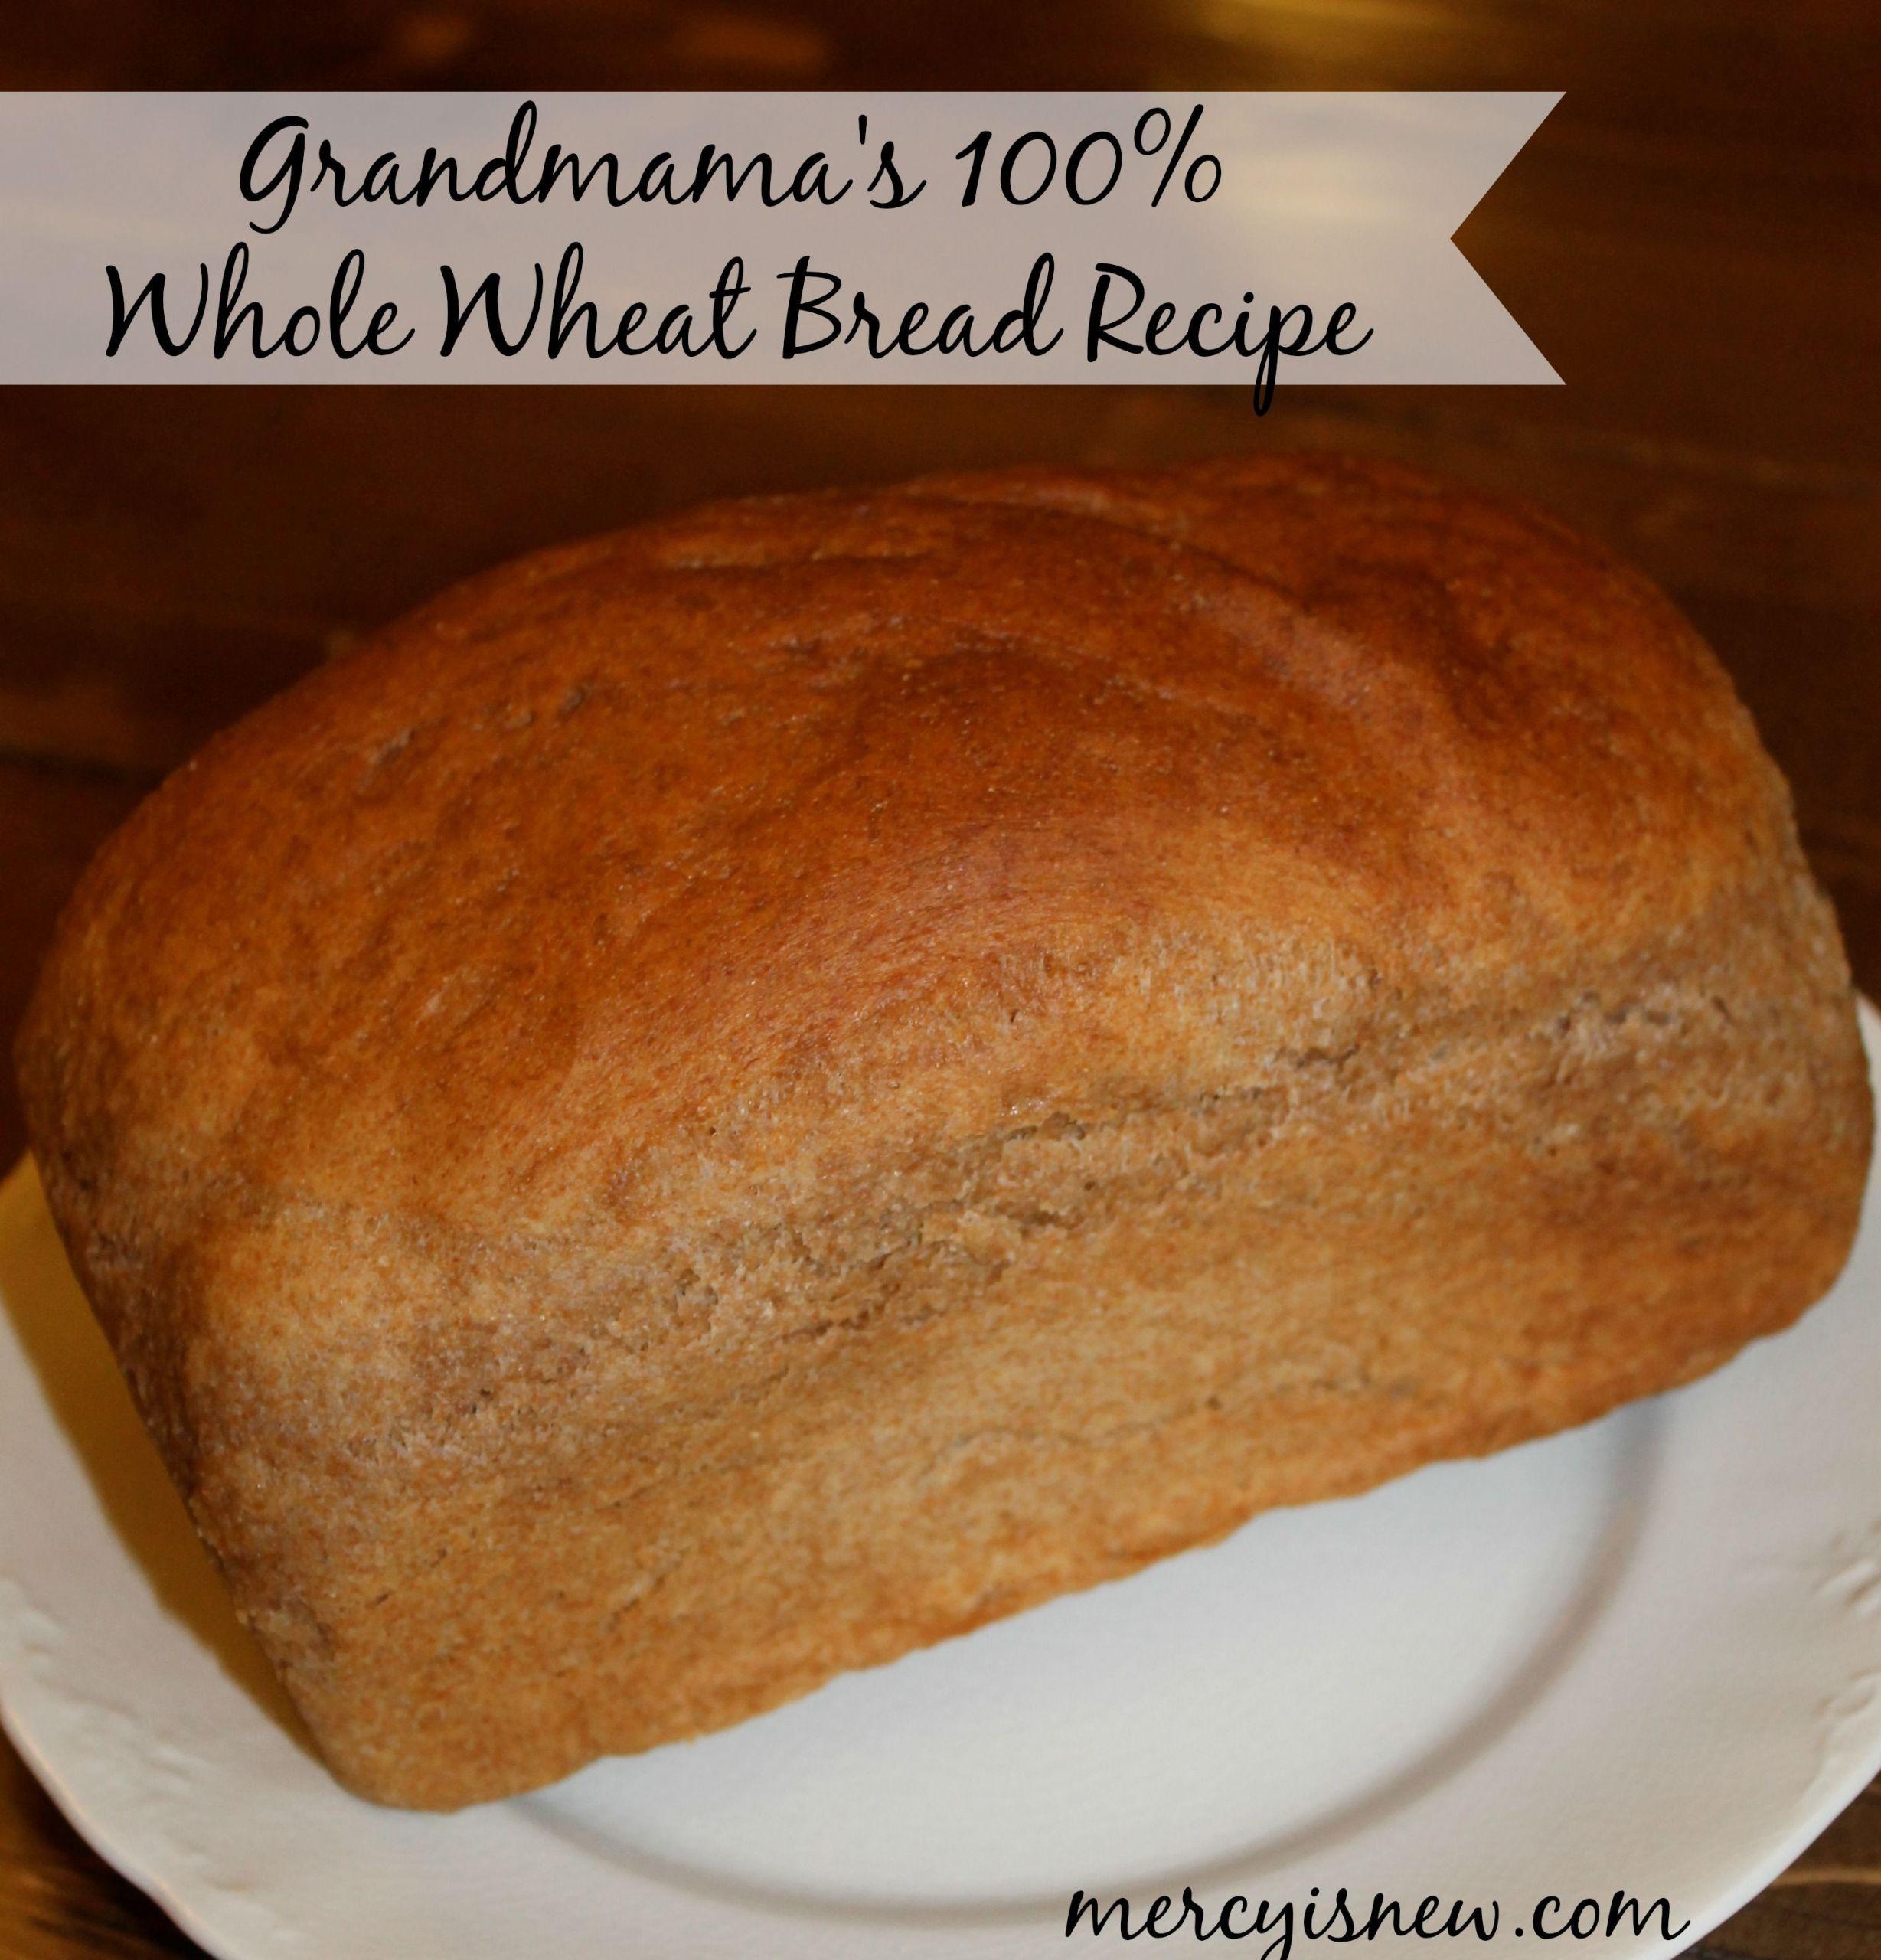 Whole Wheat Bread Low Carb  Grandmama s 100 Whole Wheat Bread Recipe mercyisnew